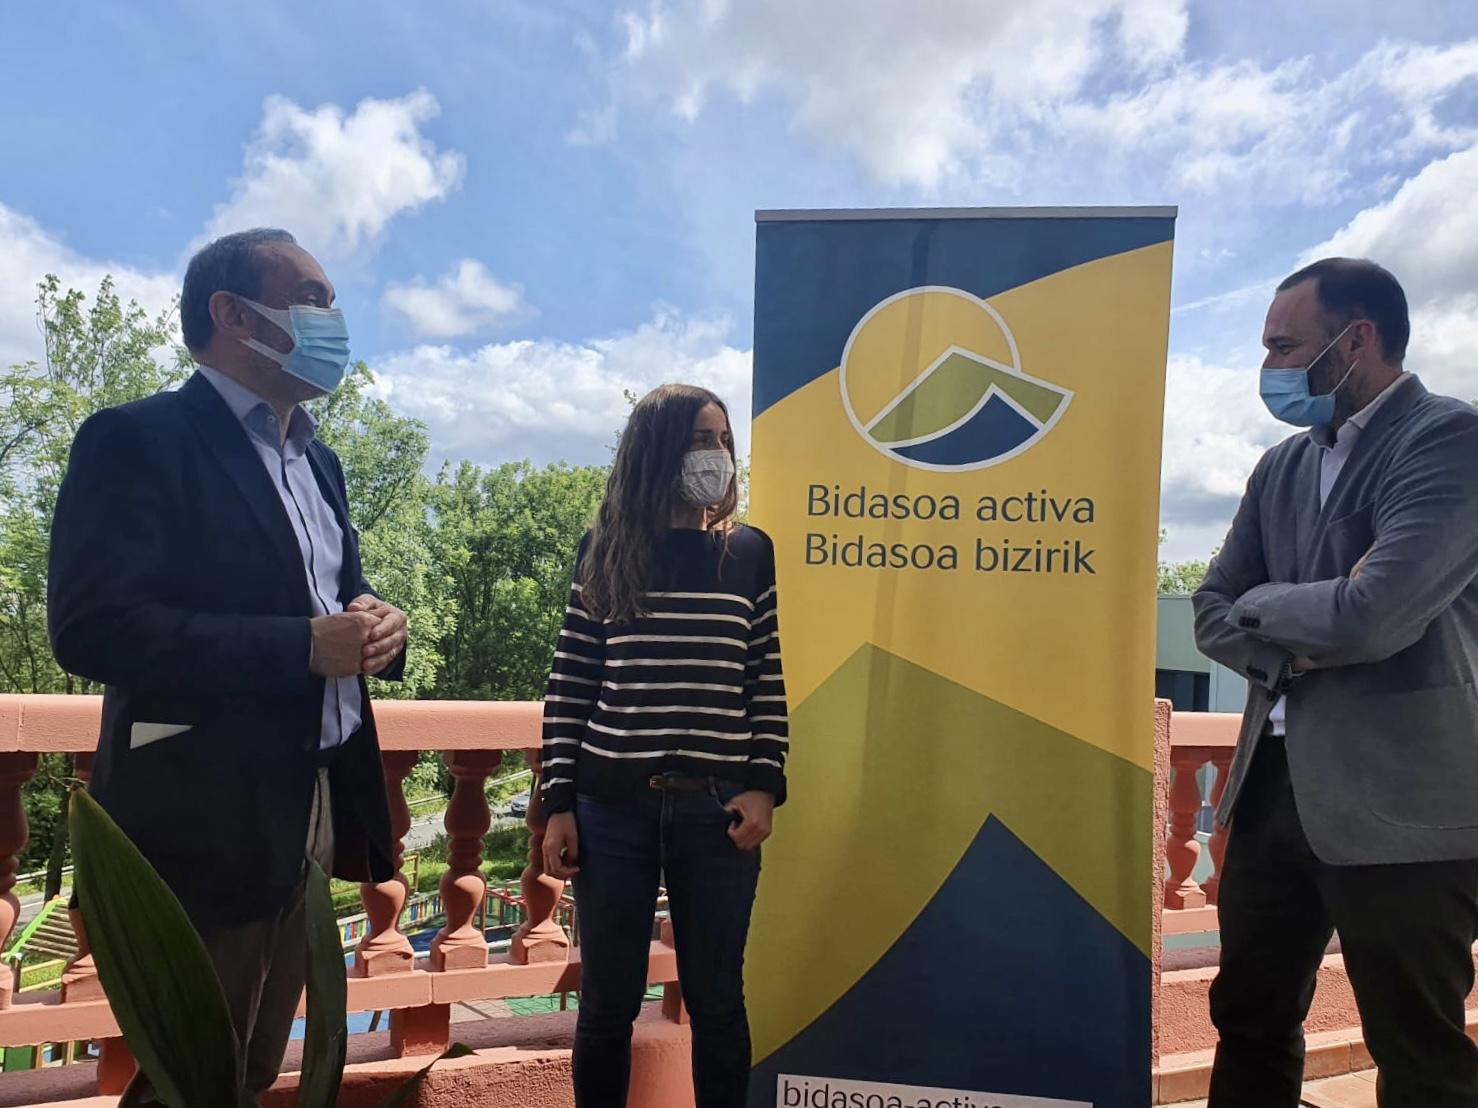 Bidasoa Activa Plan Dinamizacion Turismo